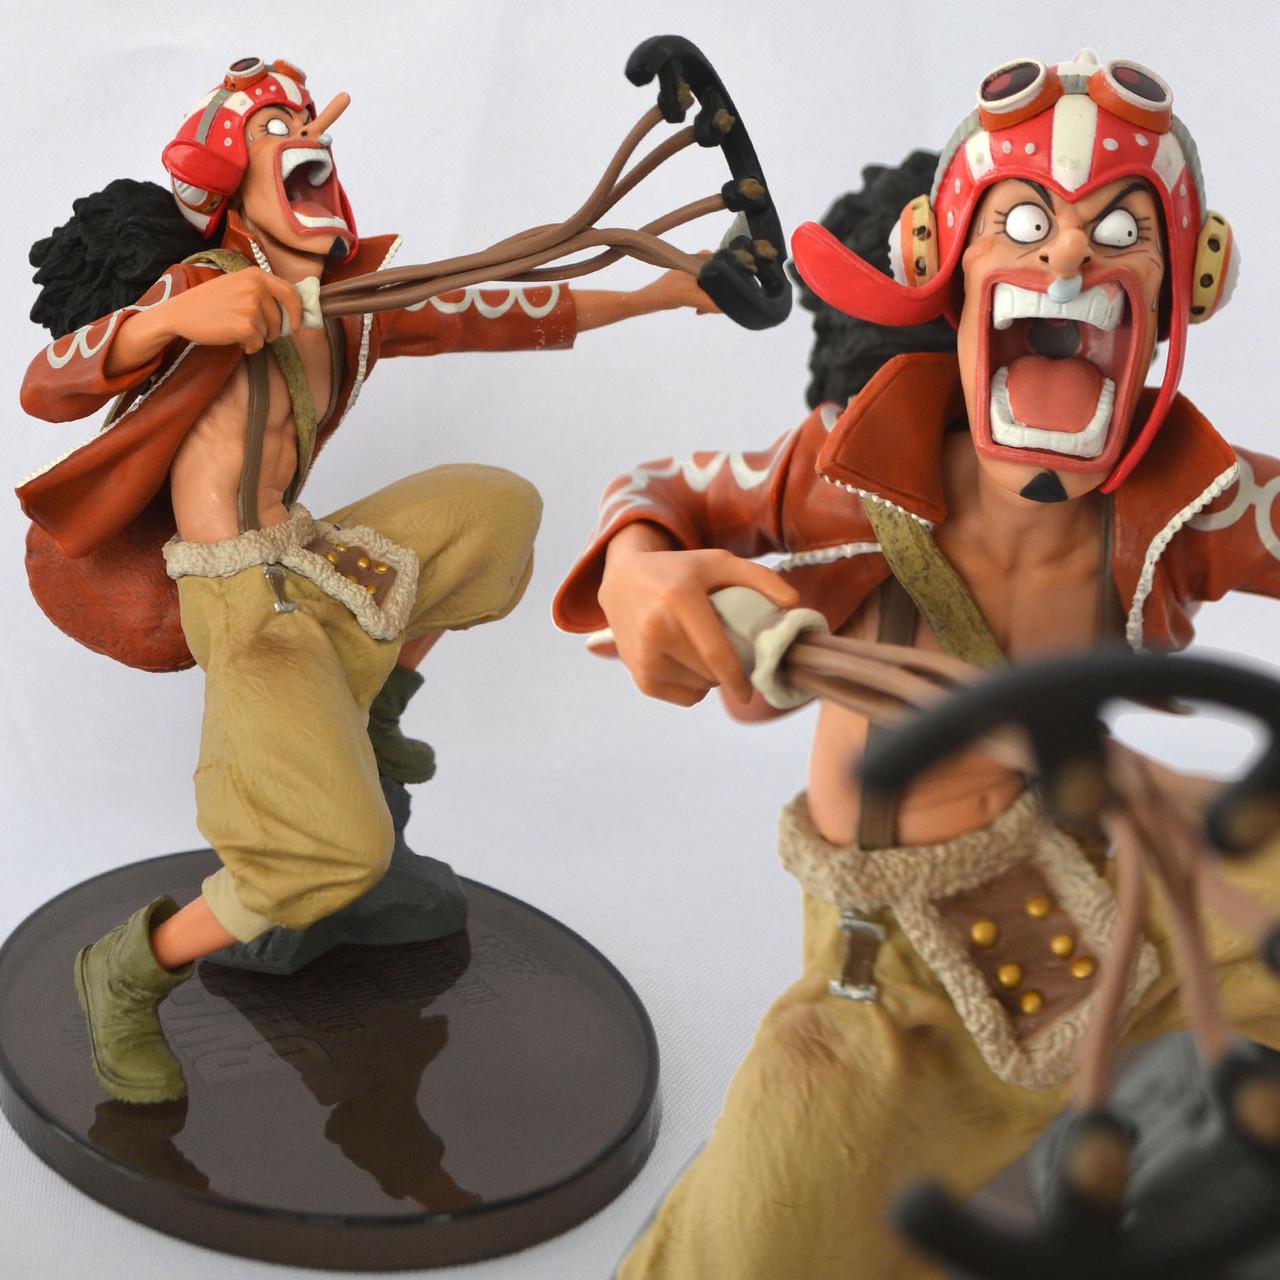 Аніме-фігурка One piece – Usopp - WORLD FIGURE COLOSSEUM BANPRESTO